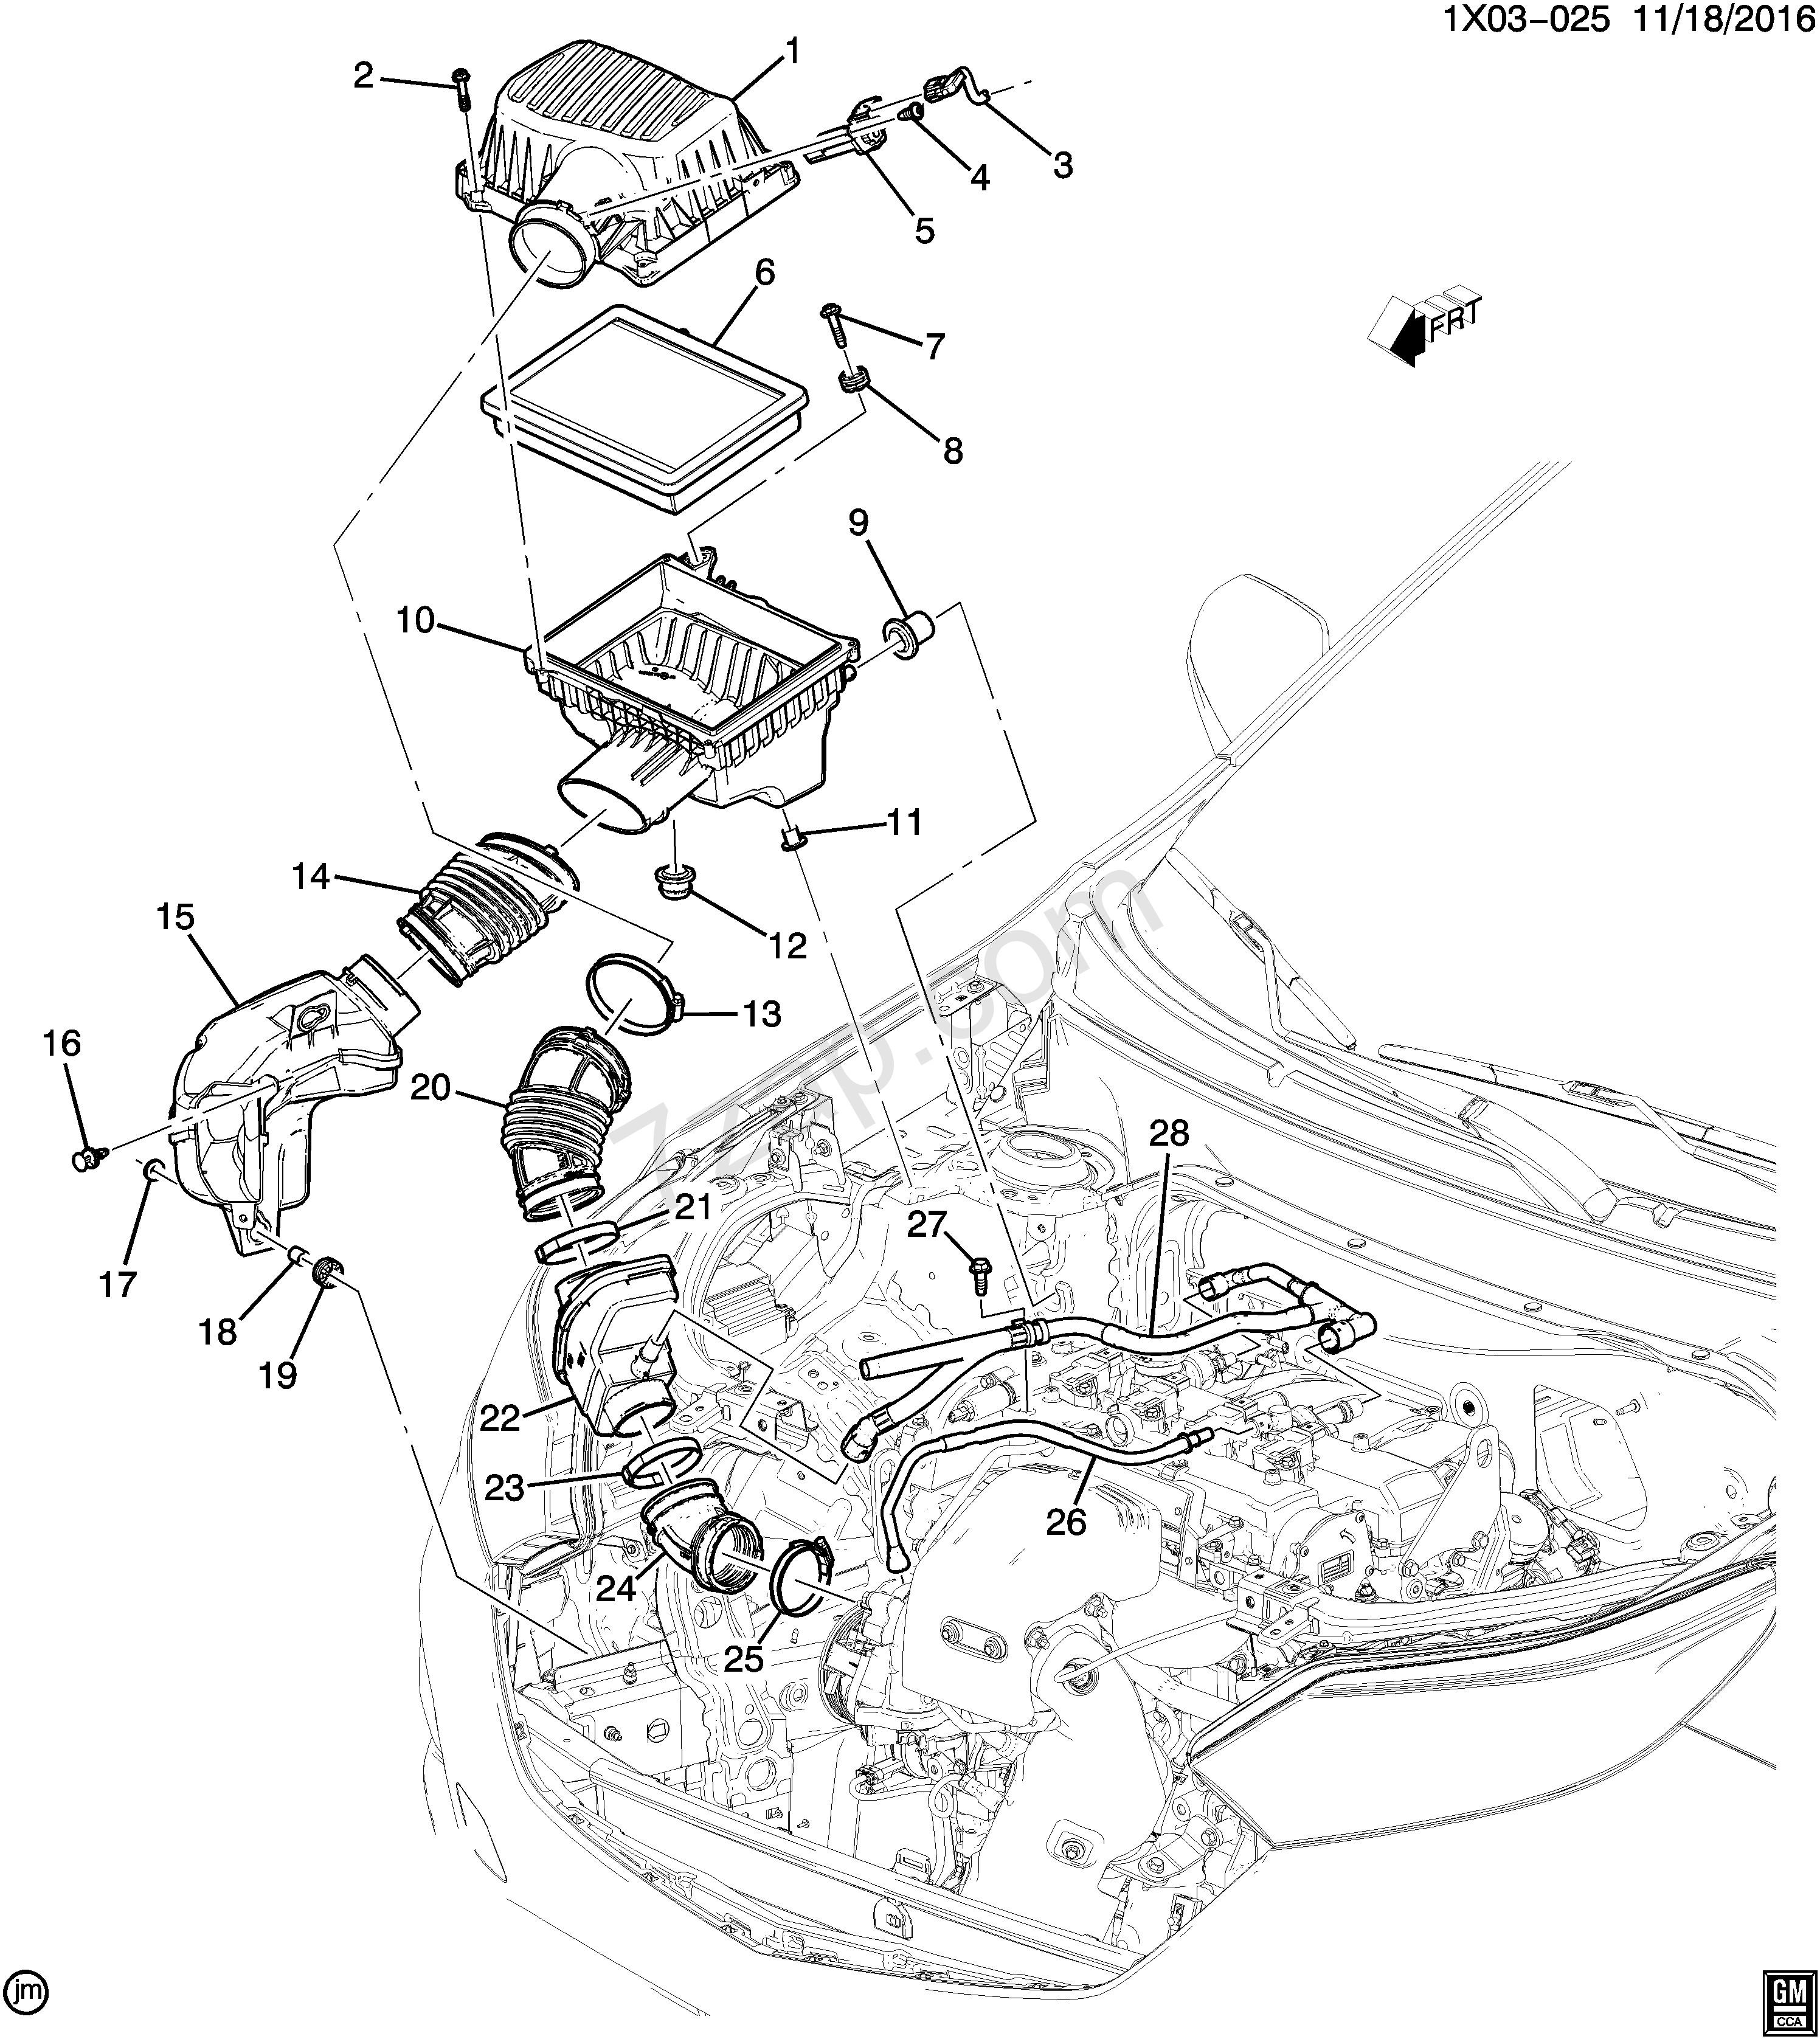 Air Intake System Diagram 2018 2018 Xr Xs26 Air Intake System Ltg 2 0x Chevrolet Equinox Equinox Of Air Intake System Diagram